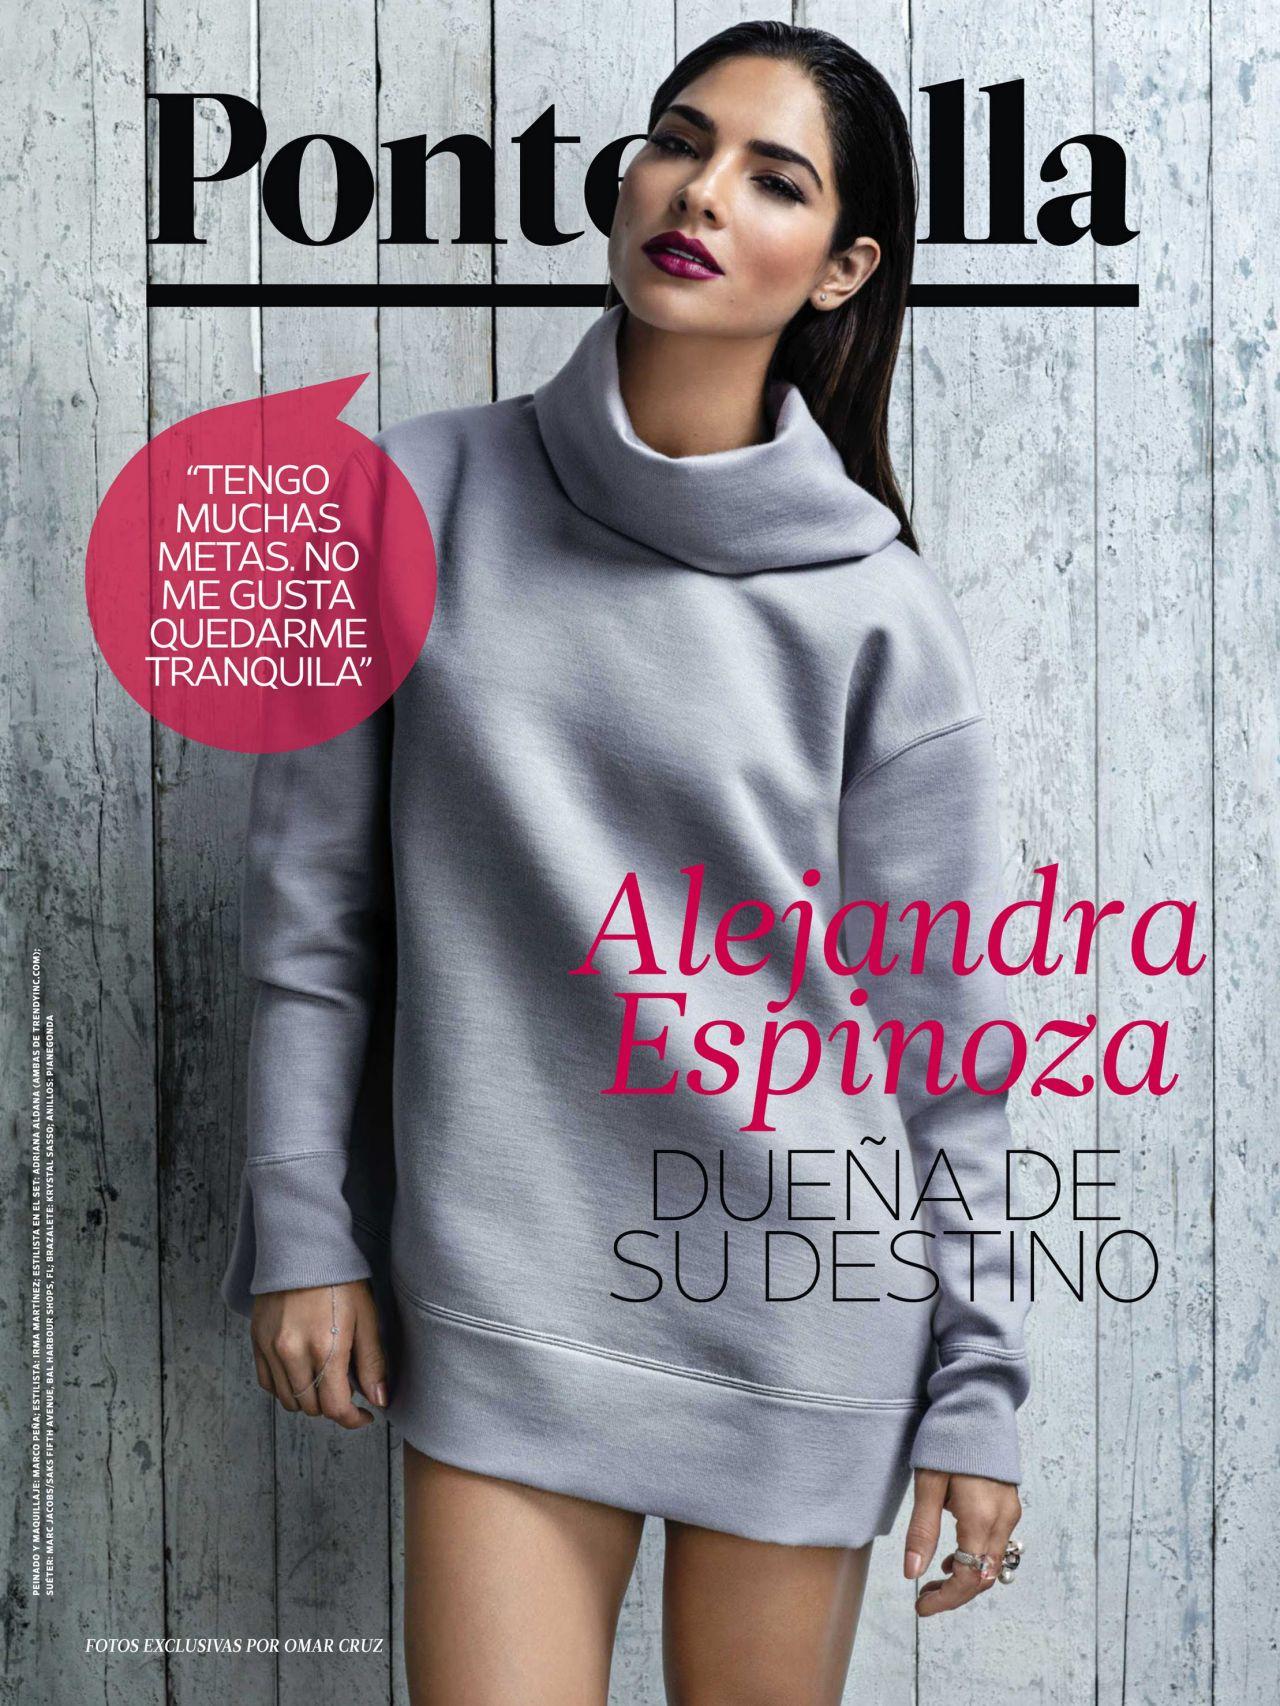 Alejandra Espinoza - People en Espanol Magazine - September 2014